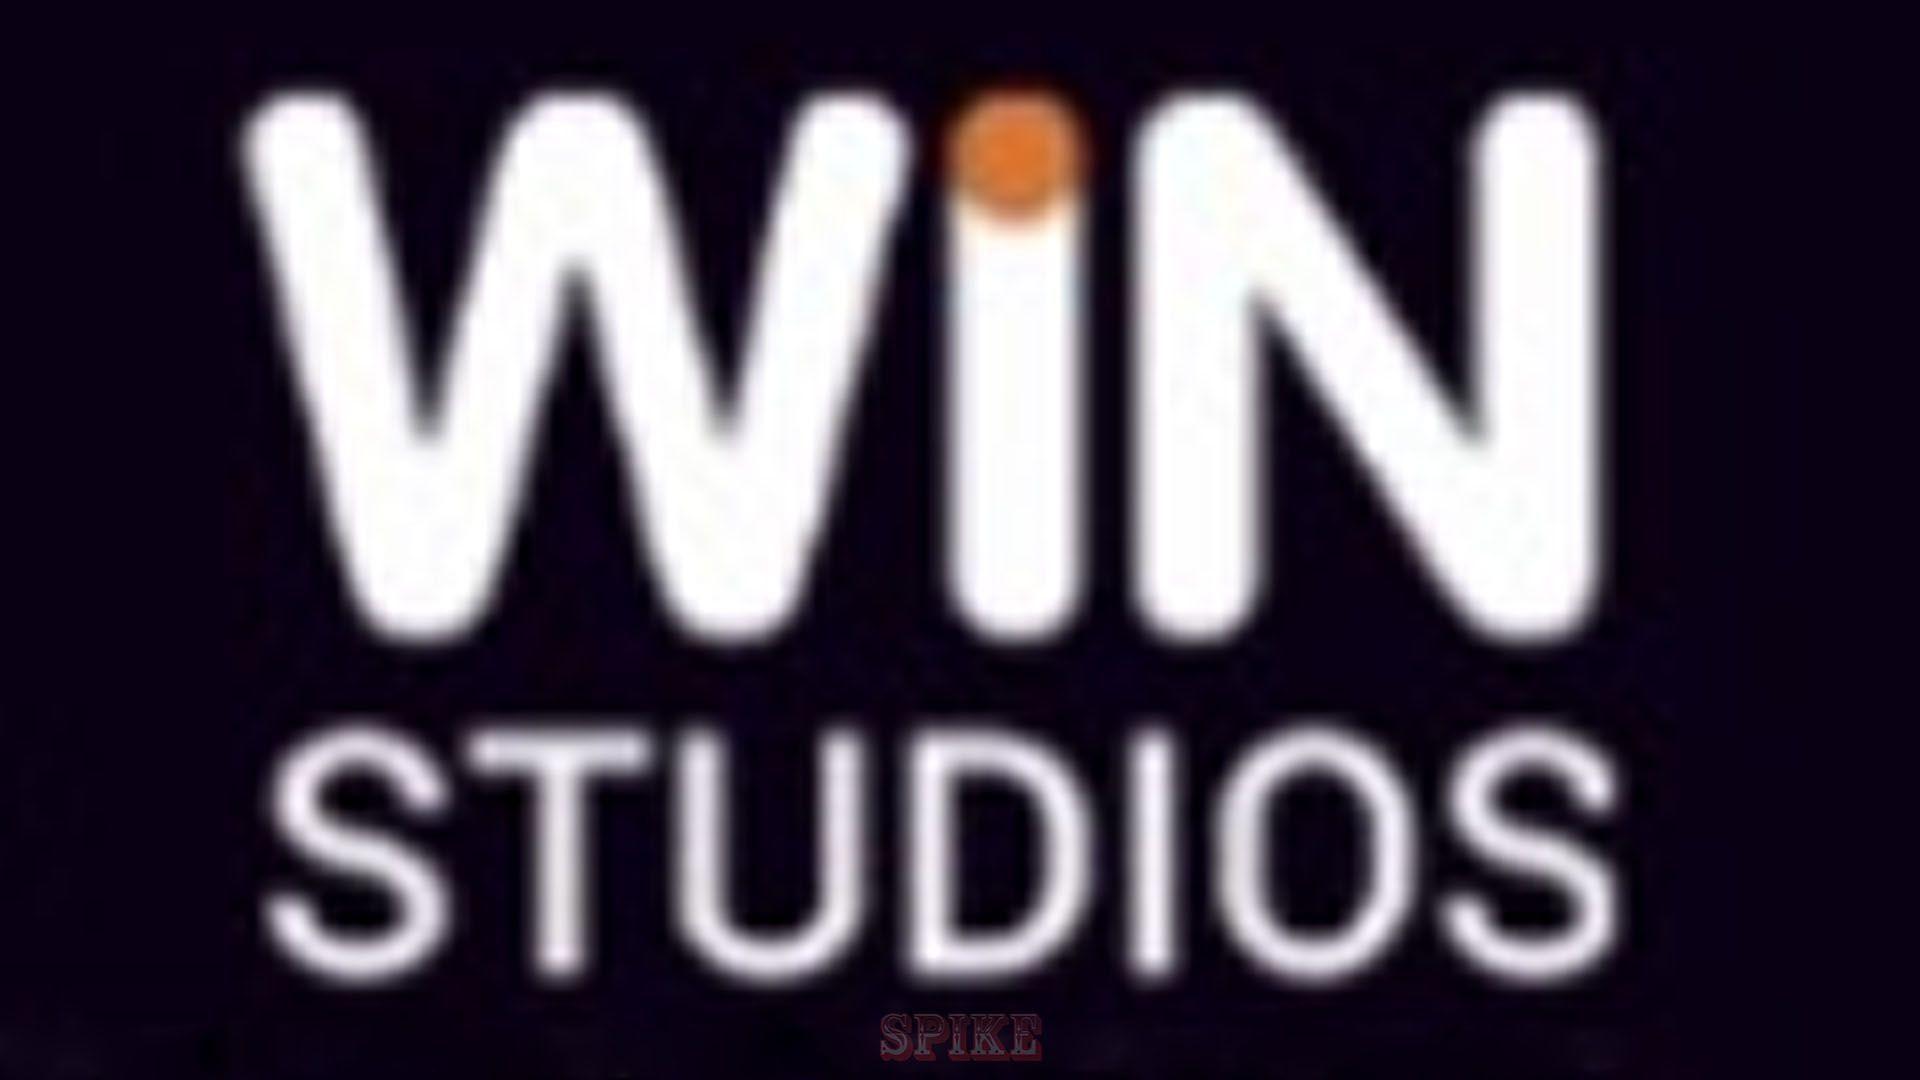 Win Studios Software Provider Free Slots